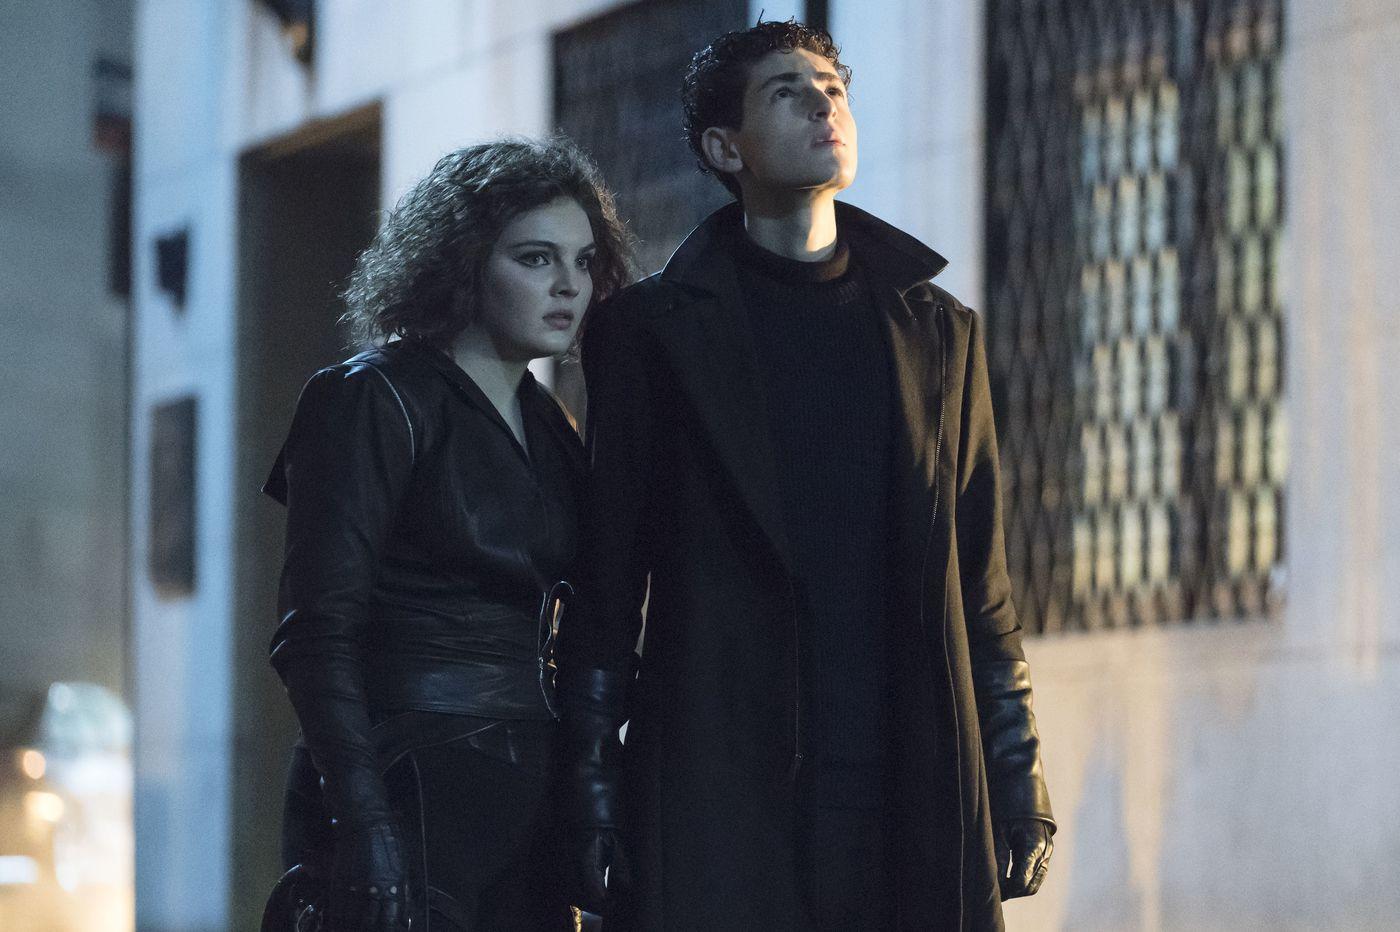 Growing up Batman: As 'Gotham' nears its end, David Mazouz talks about his journey toward the Batsuit